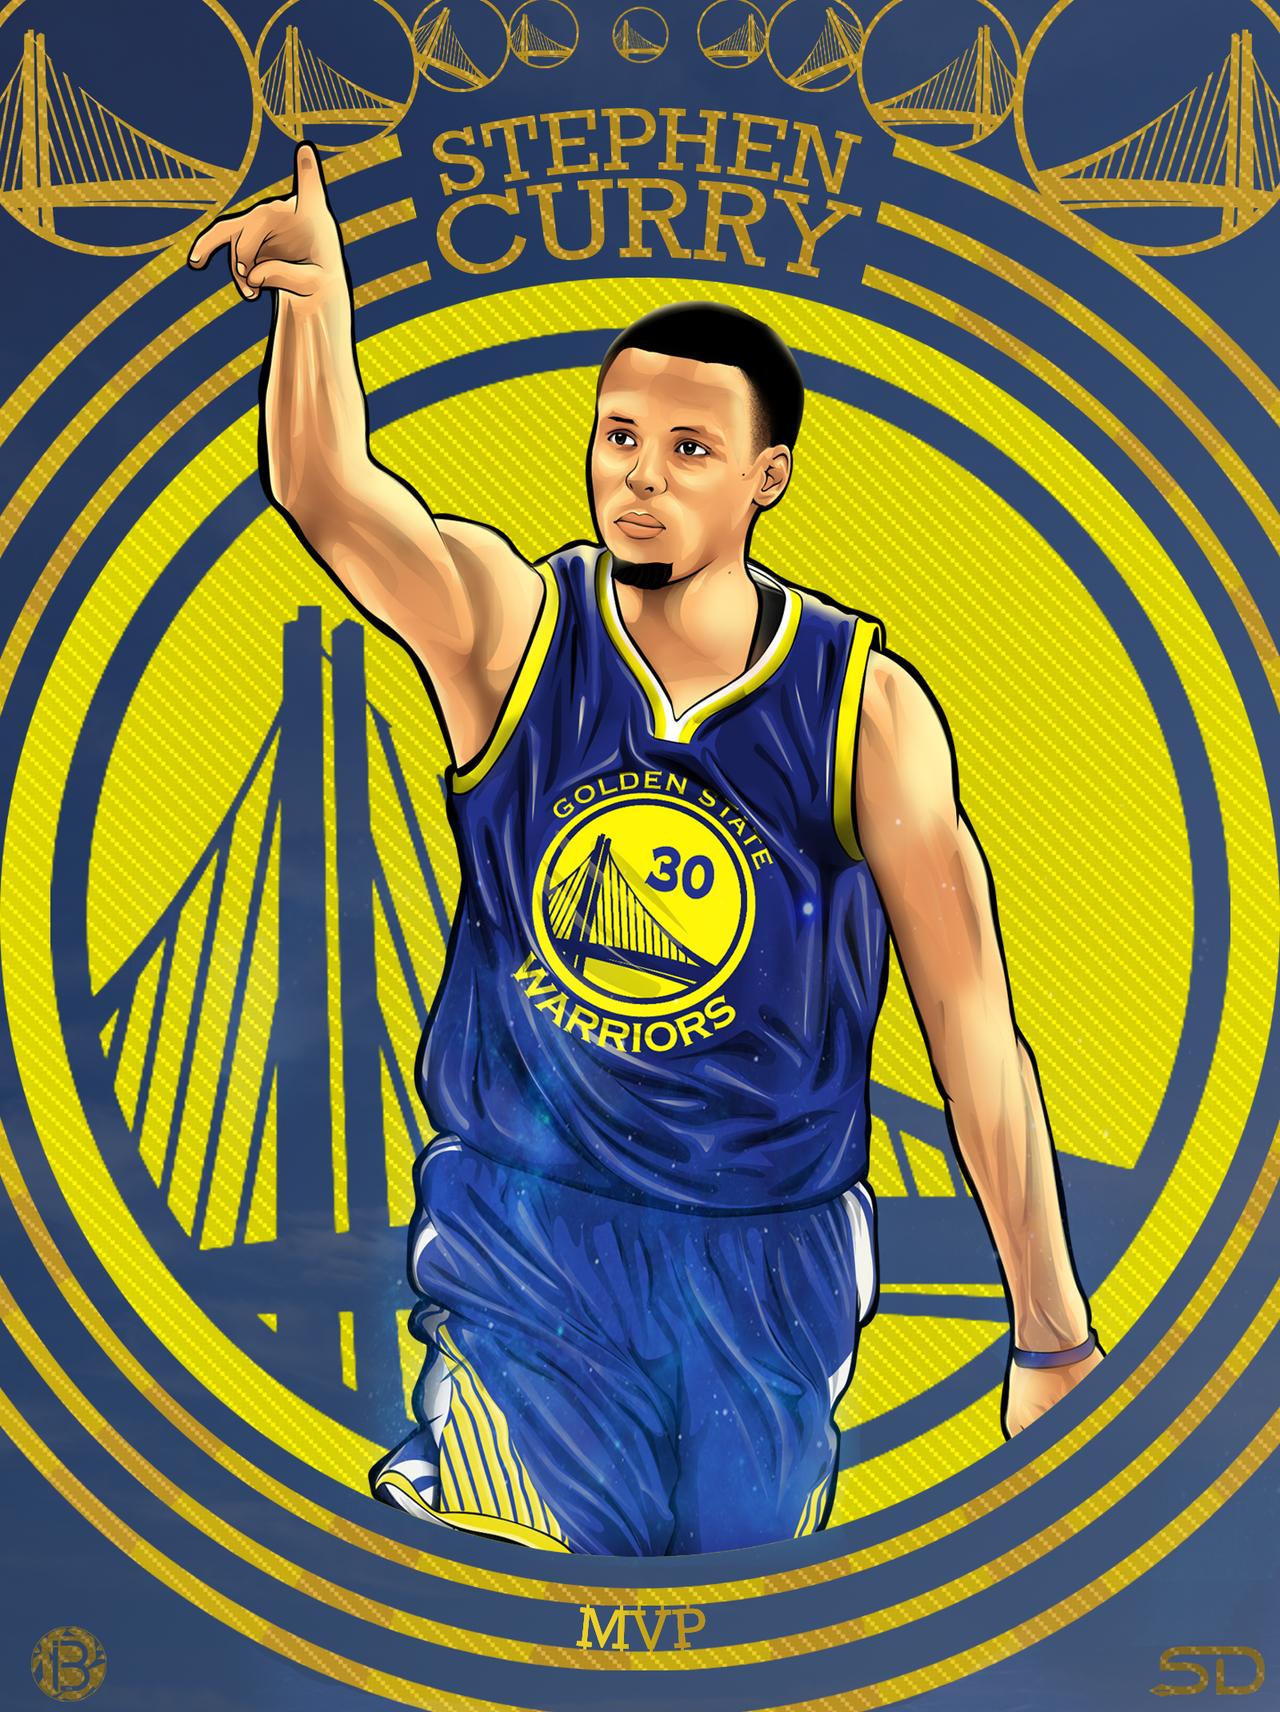 Stephen Curry Cartoon Wallpaper 6840 Pixhd